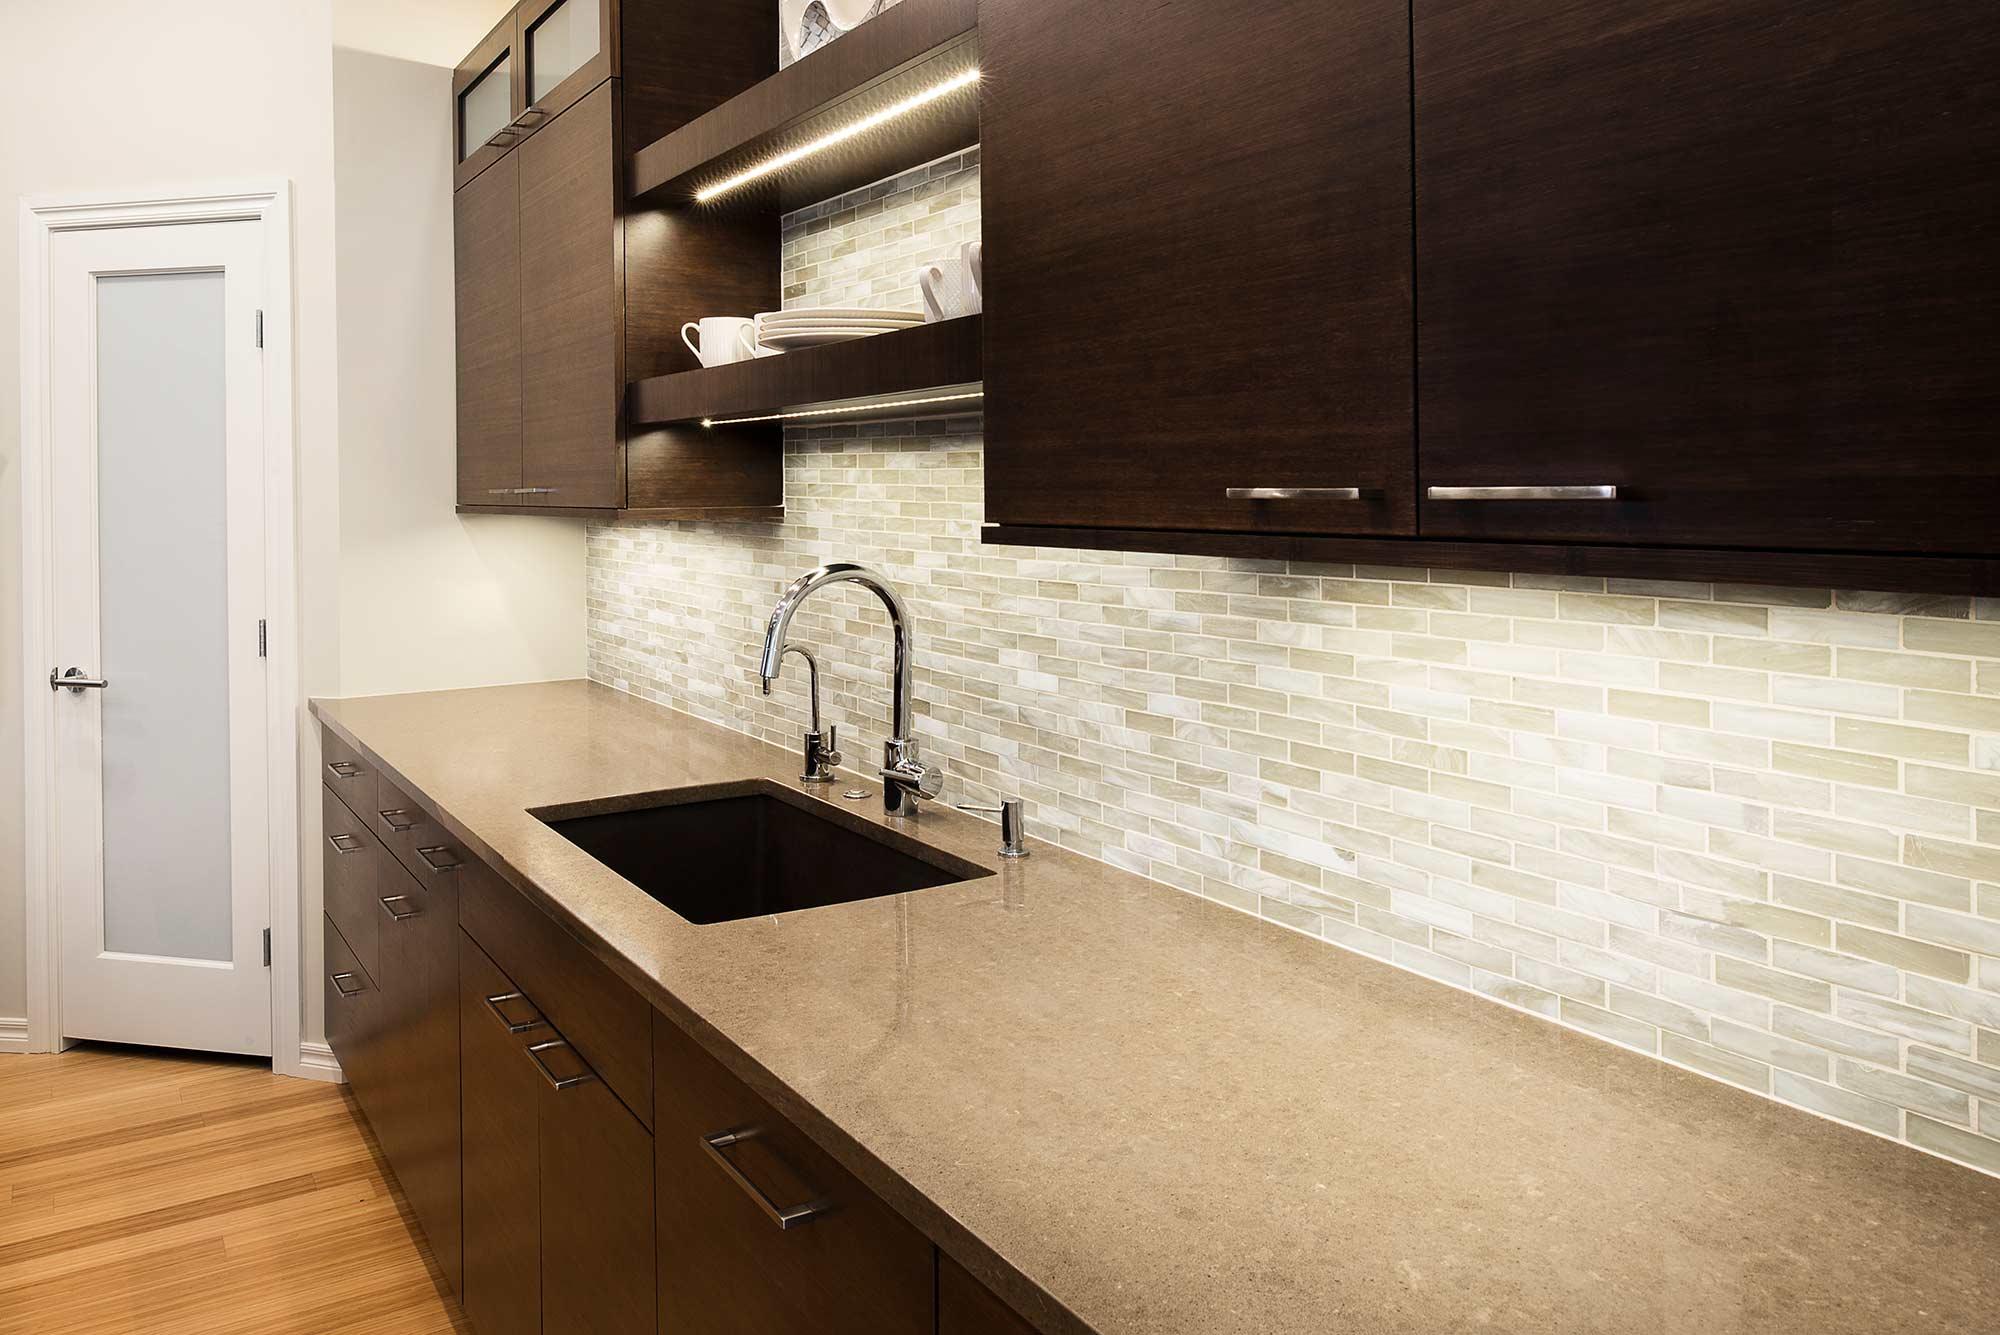 renewedbamboo | kitchen design tulsa